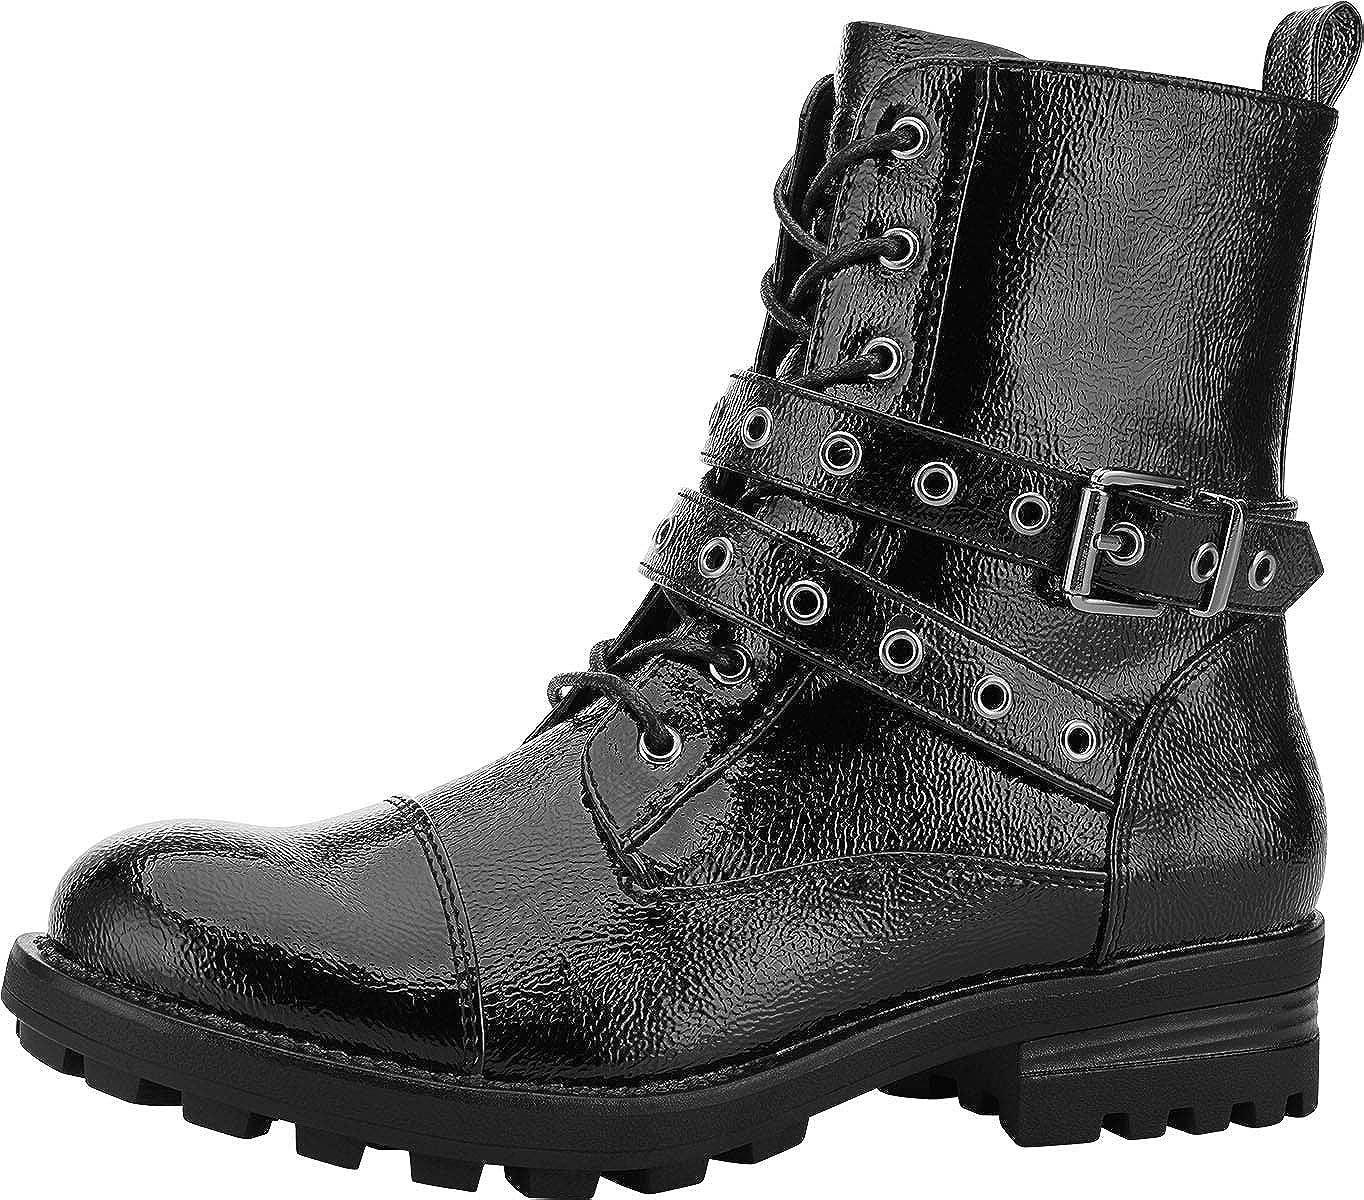 Yolanda Zula Women's Black Combat Boots